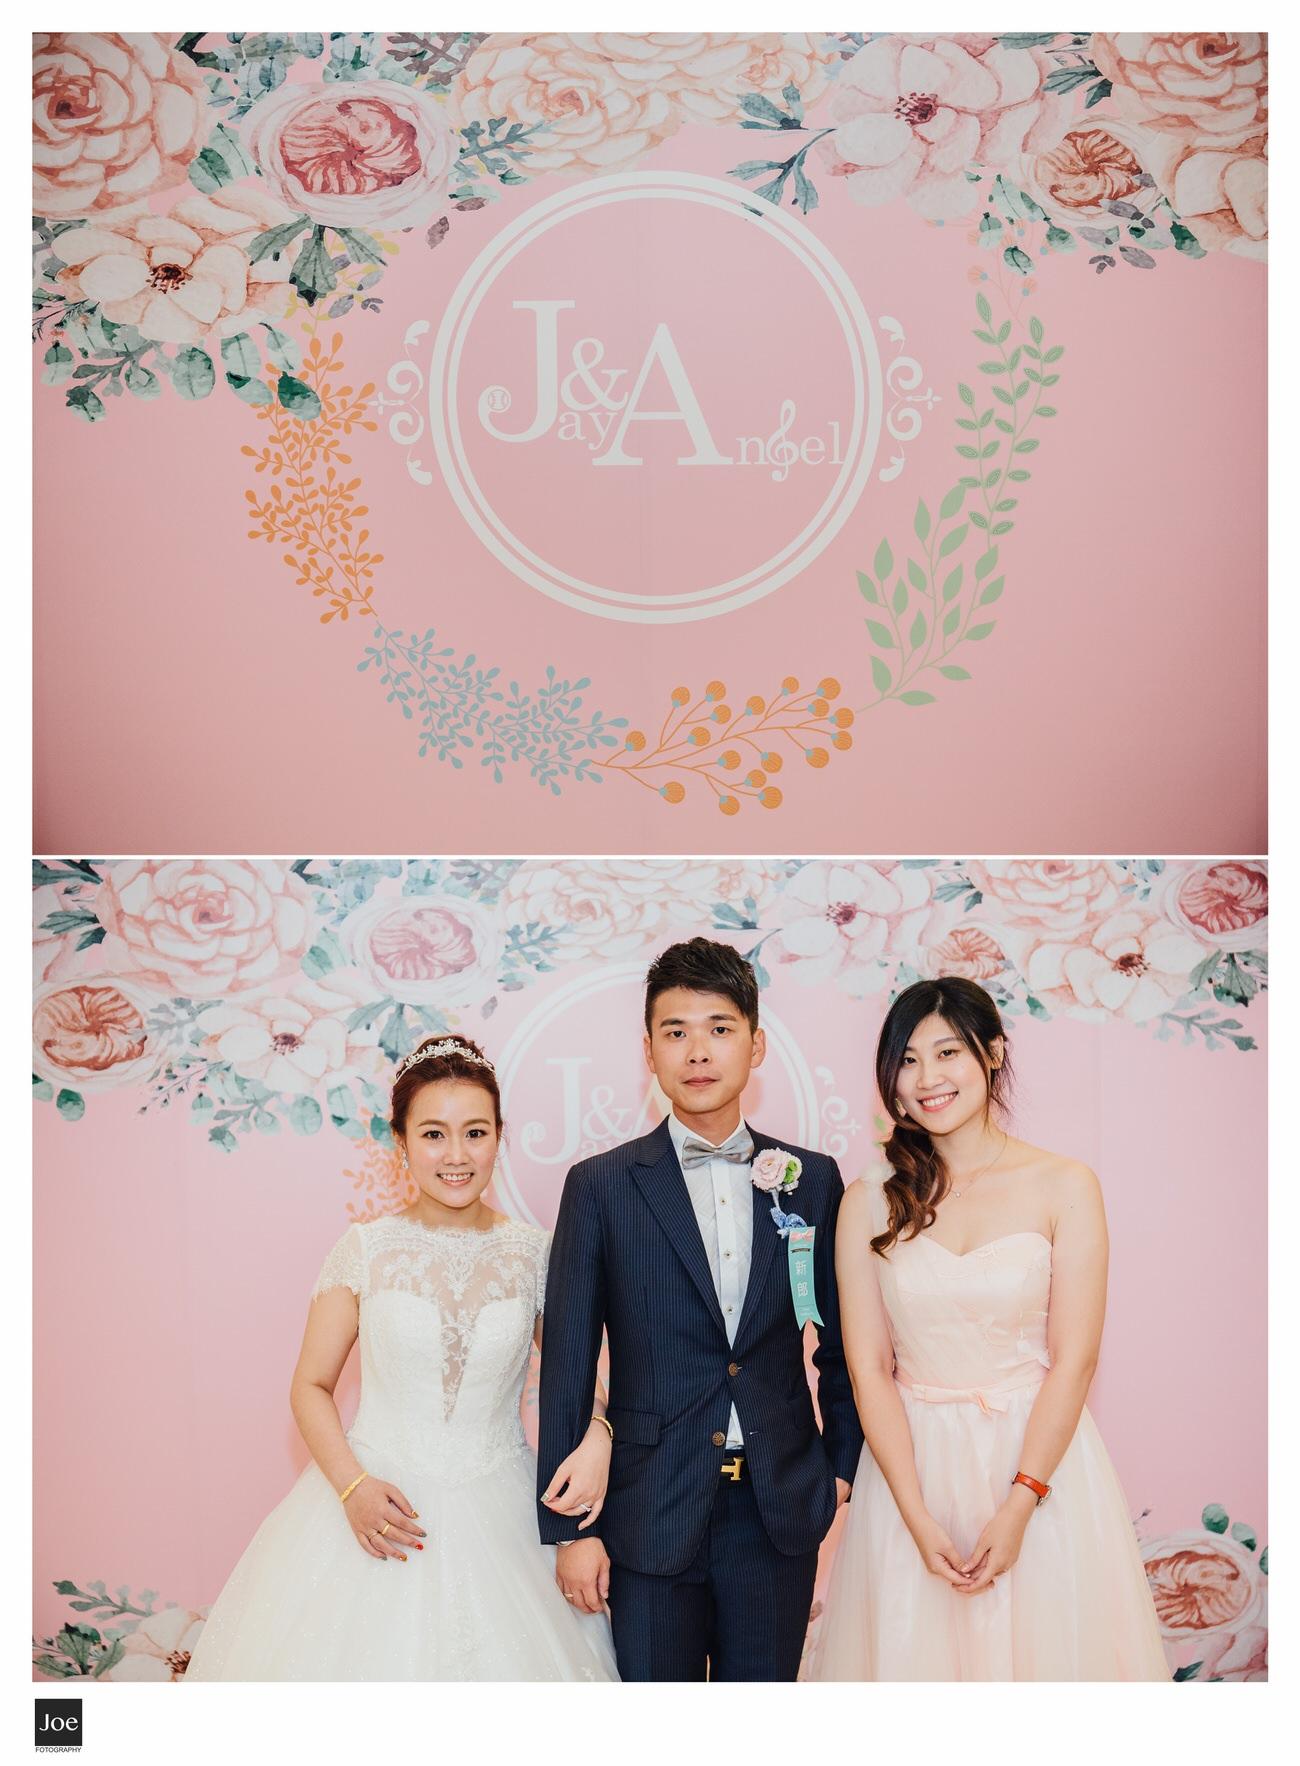 sunworld-dynasty-hotel-taipei-wedding-photo-joe-fotography-angel-jay-093.jpg